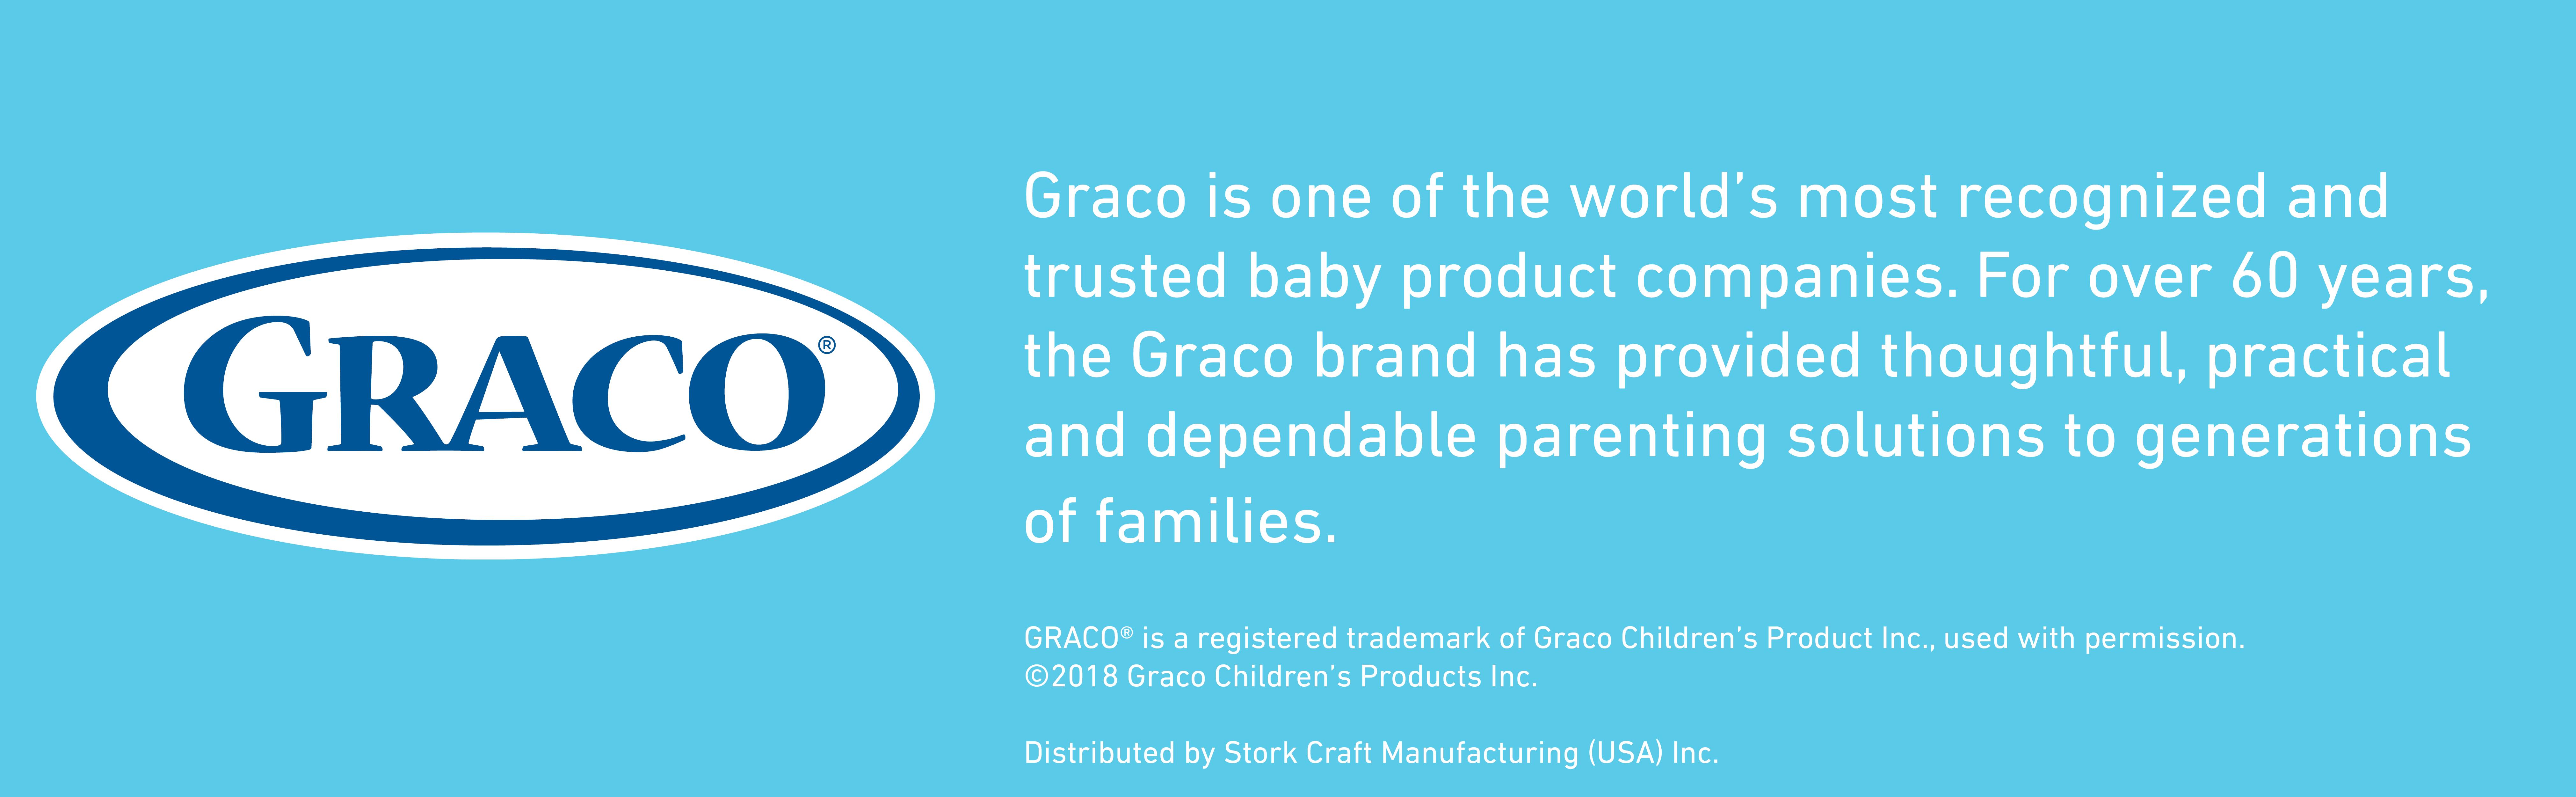 Graco Premium Foam Crib and Toddler Mattress - Walmart com